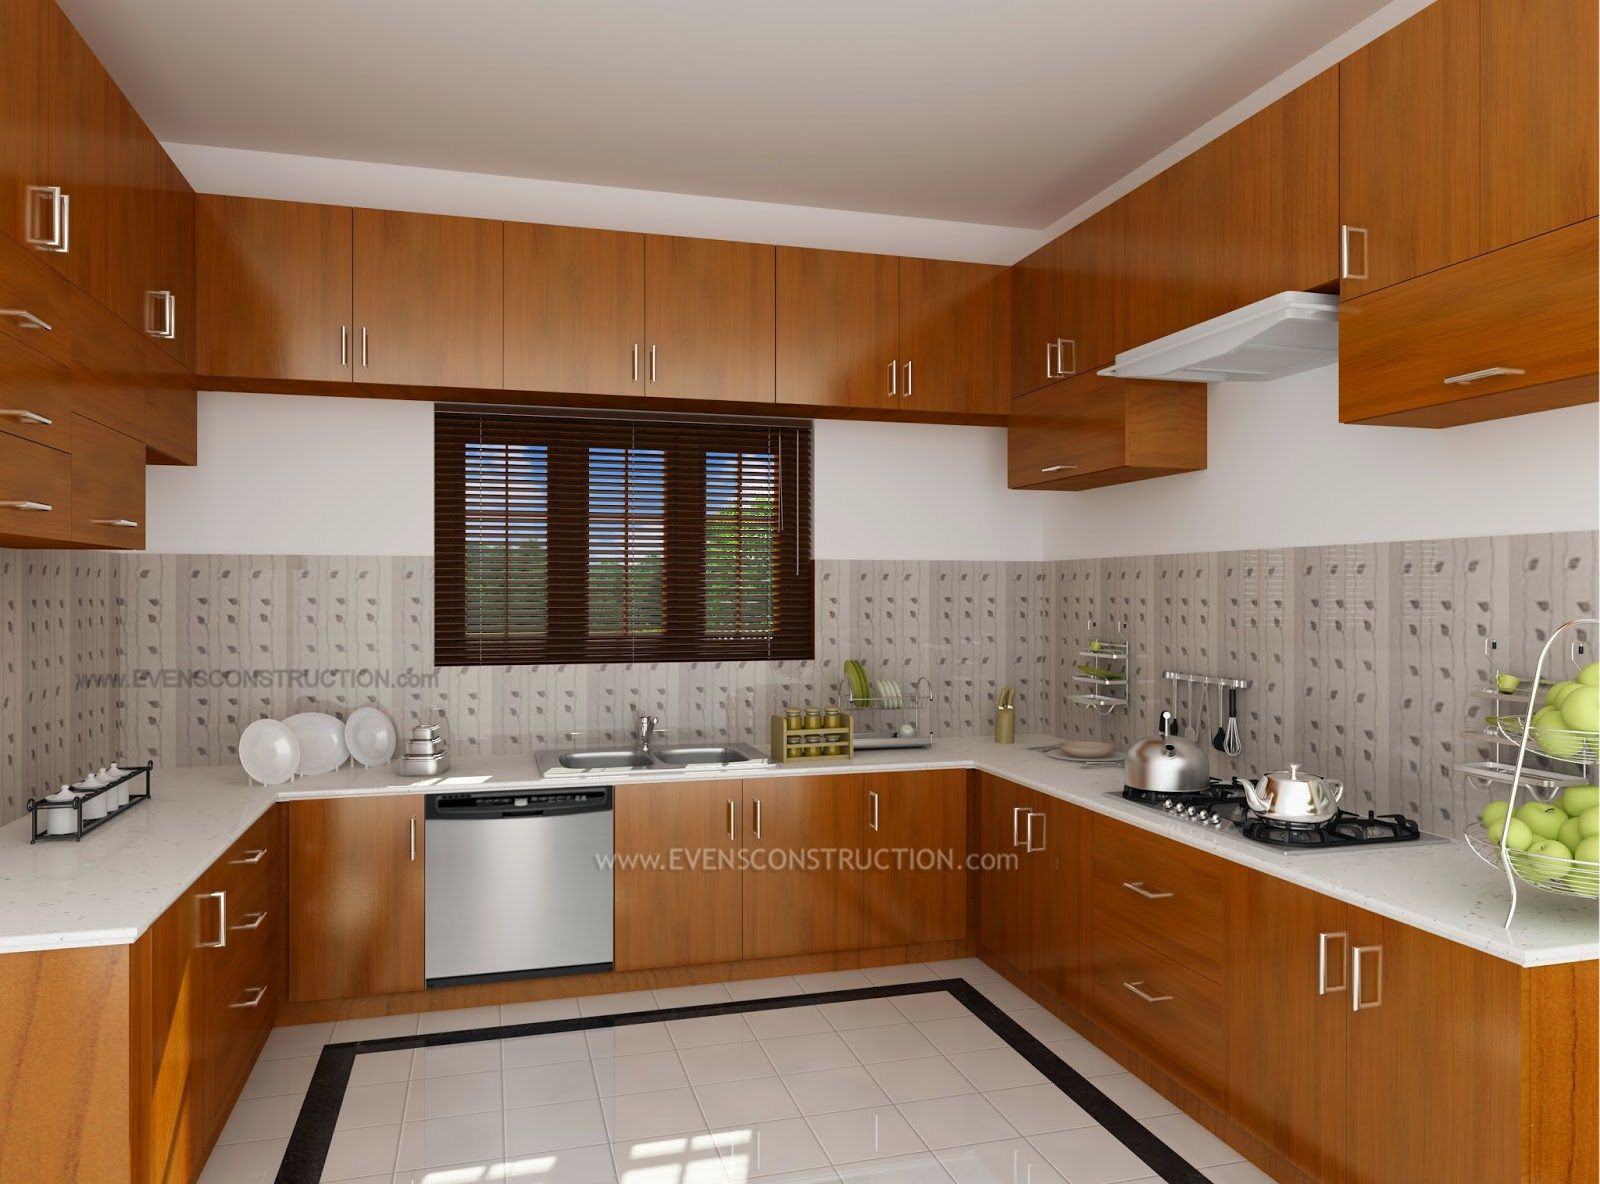 Interior Design Kitchen Organizing Ideas Home Kerala Modern House